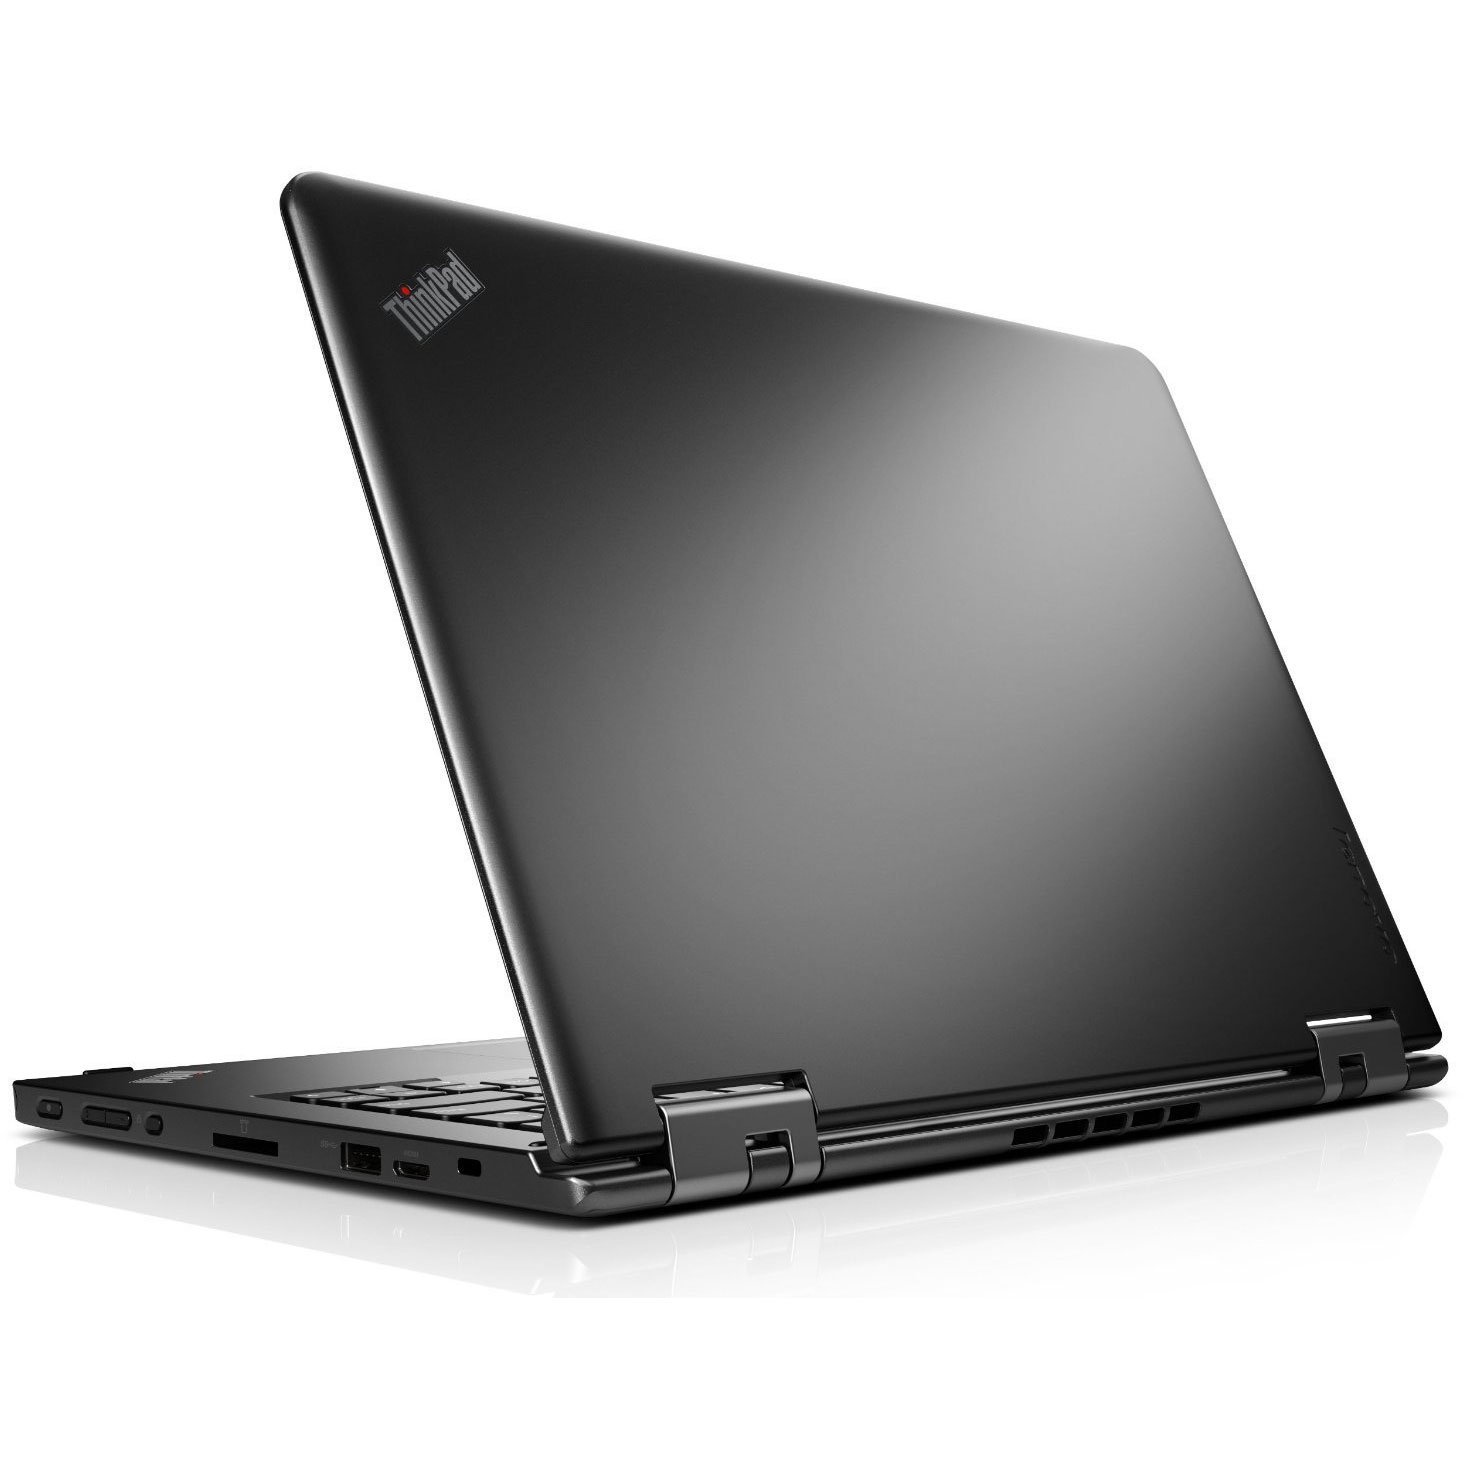 Amazon.com: Lenovo ThinkPad Yoga Signature Edition - 12.5